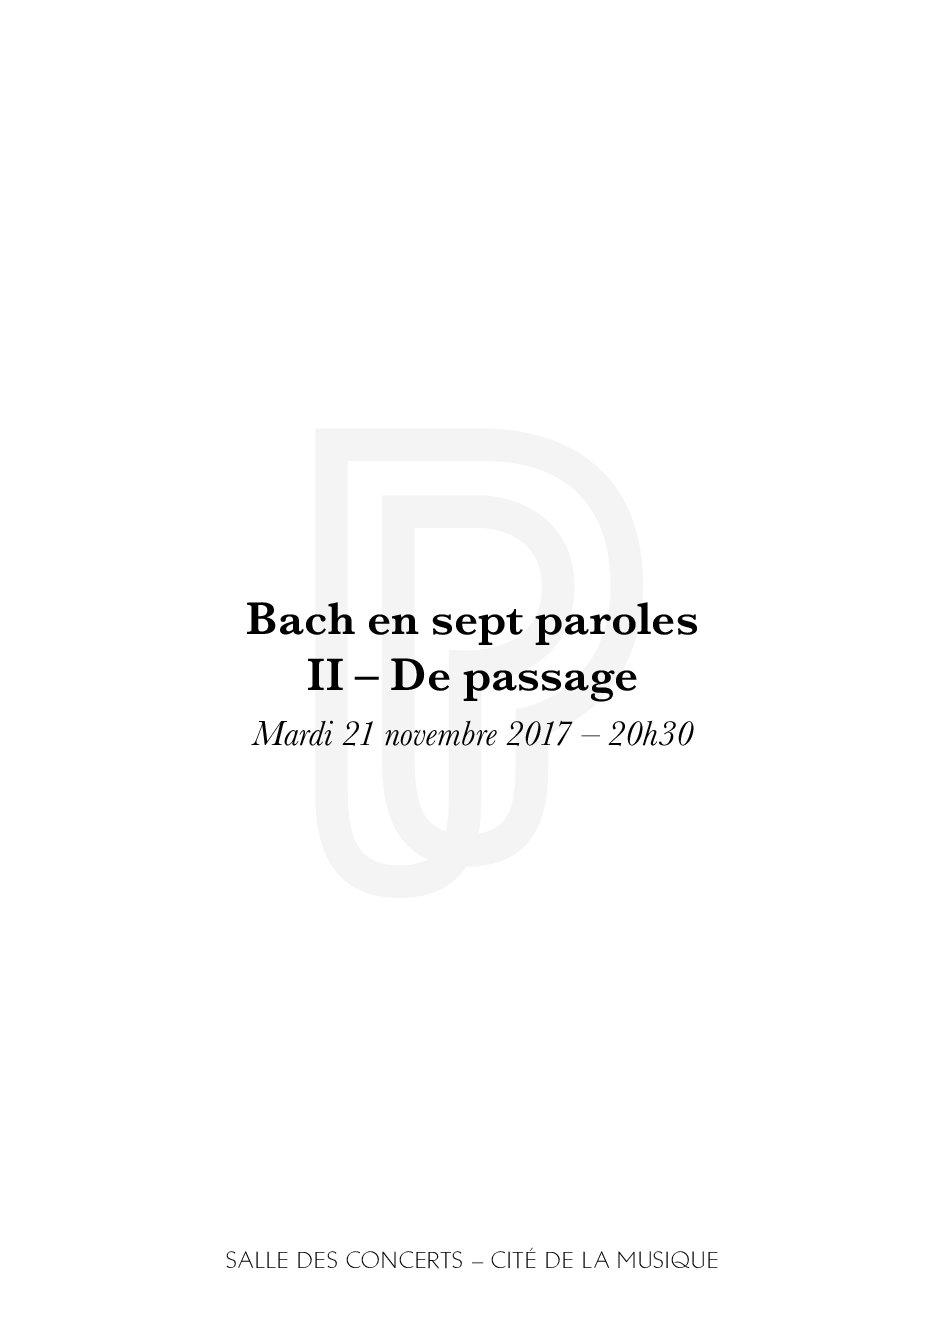 Raphael Pichon & Ensemble Pygmalion - Bach Cantatas & Other Vocal